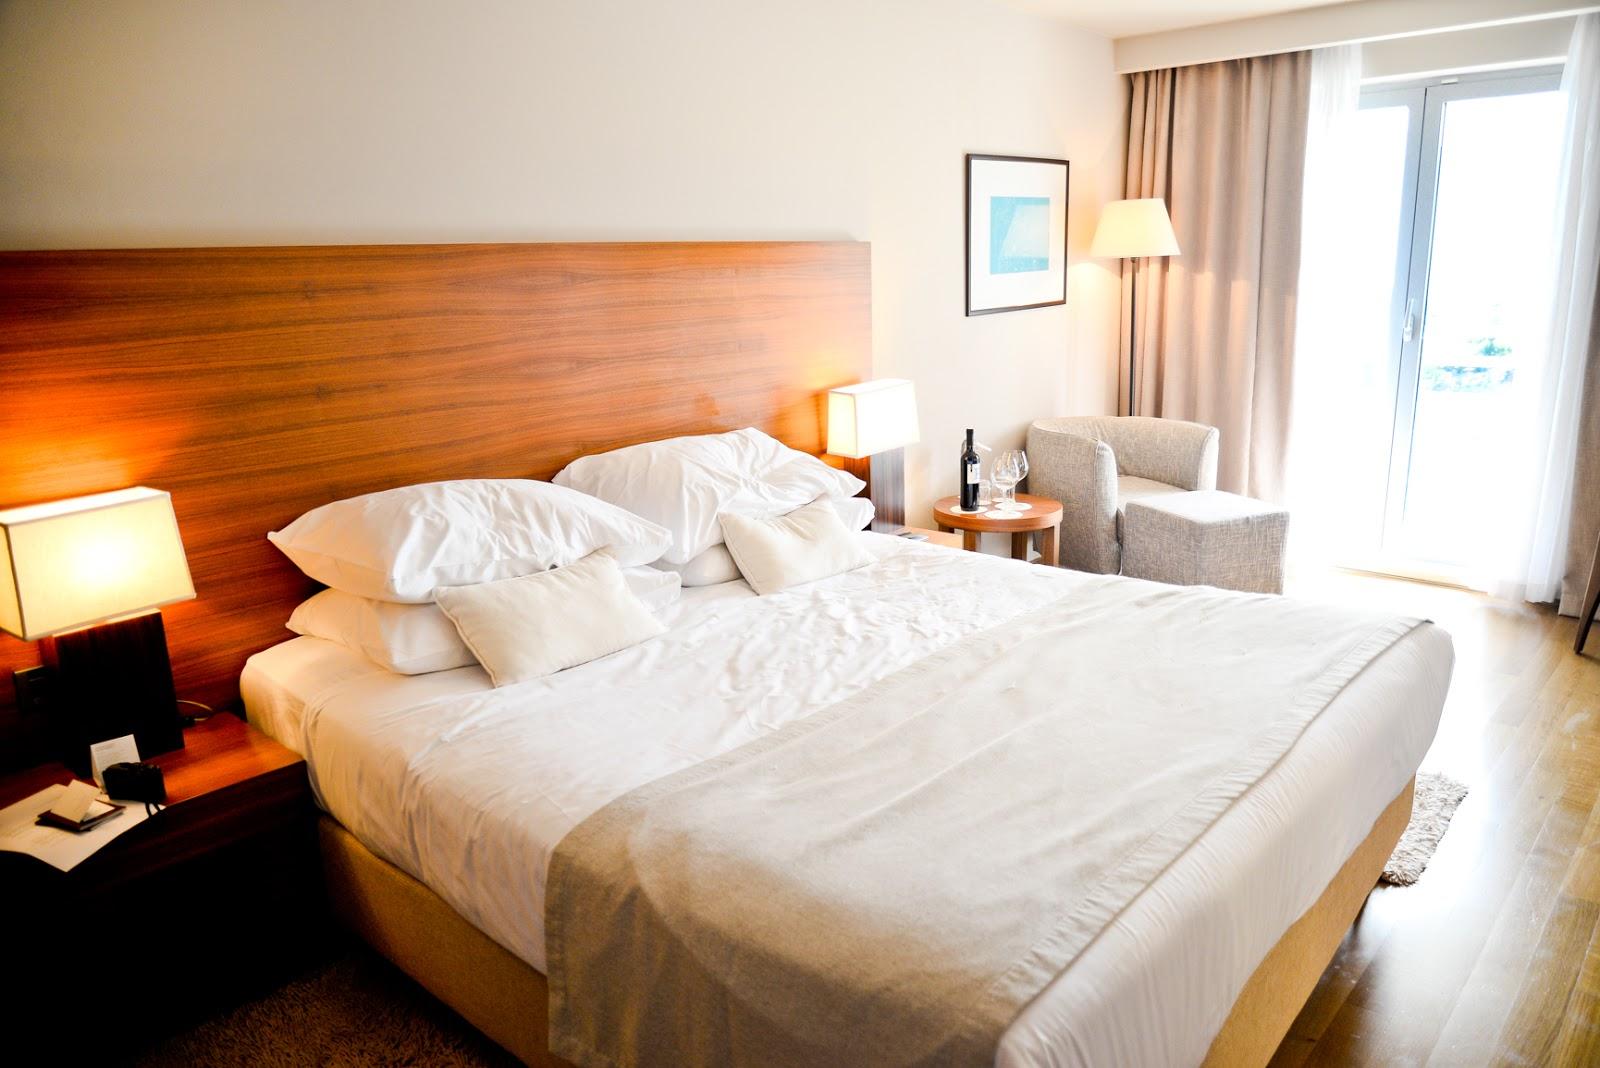 bellevue hotel dubrovnik,